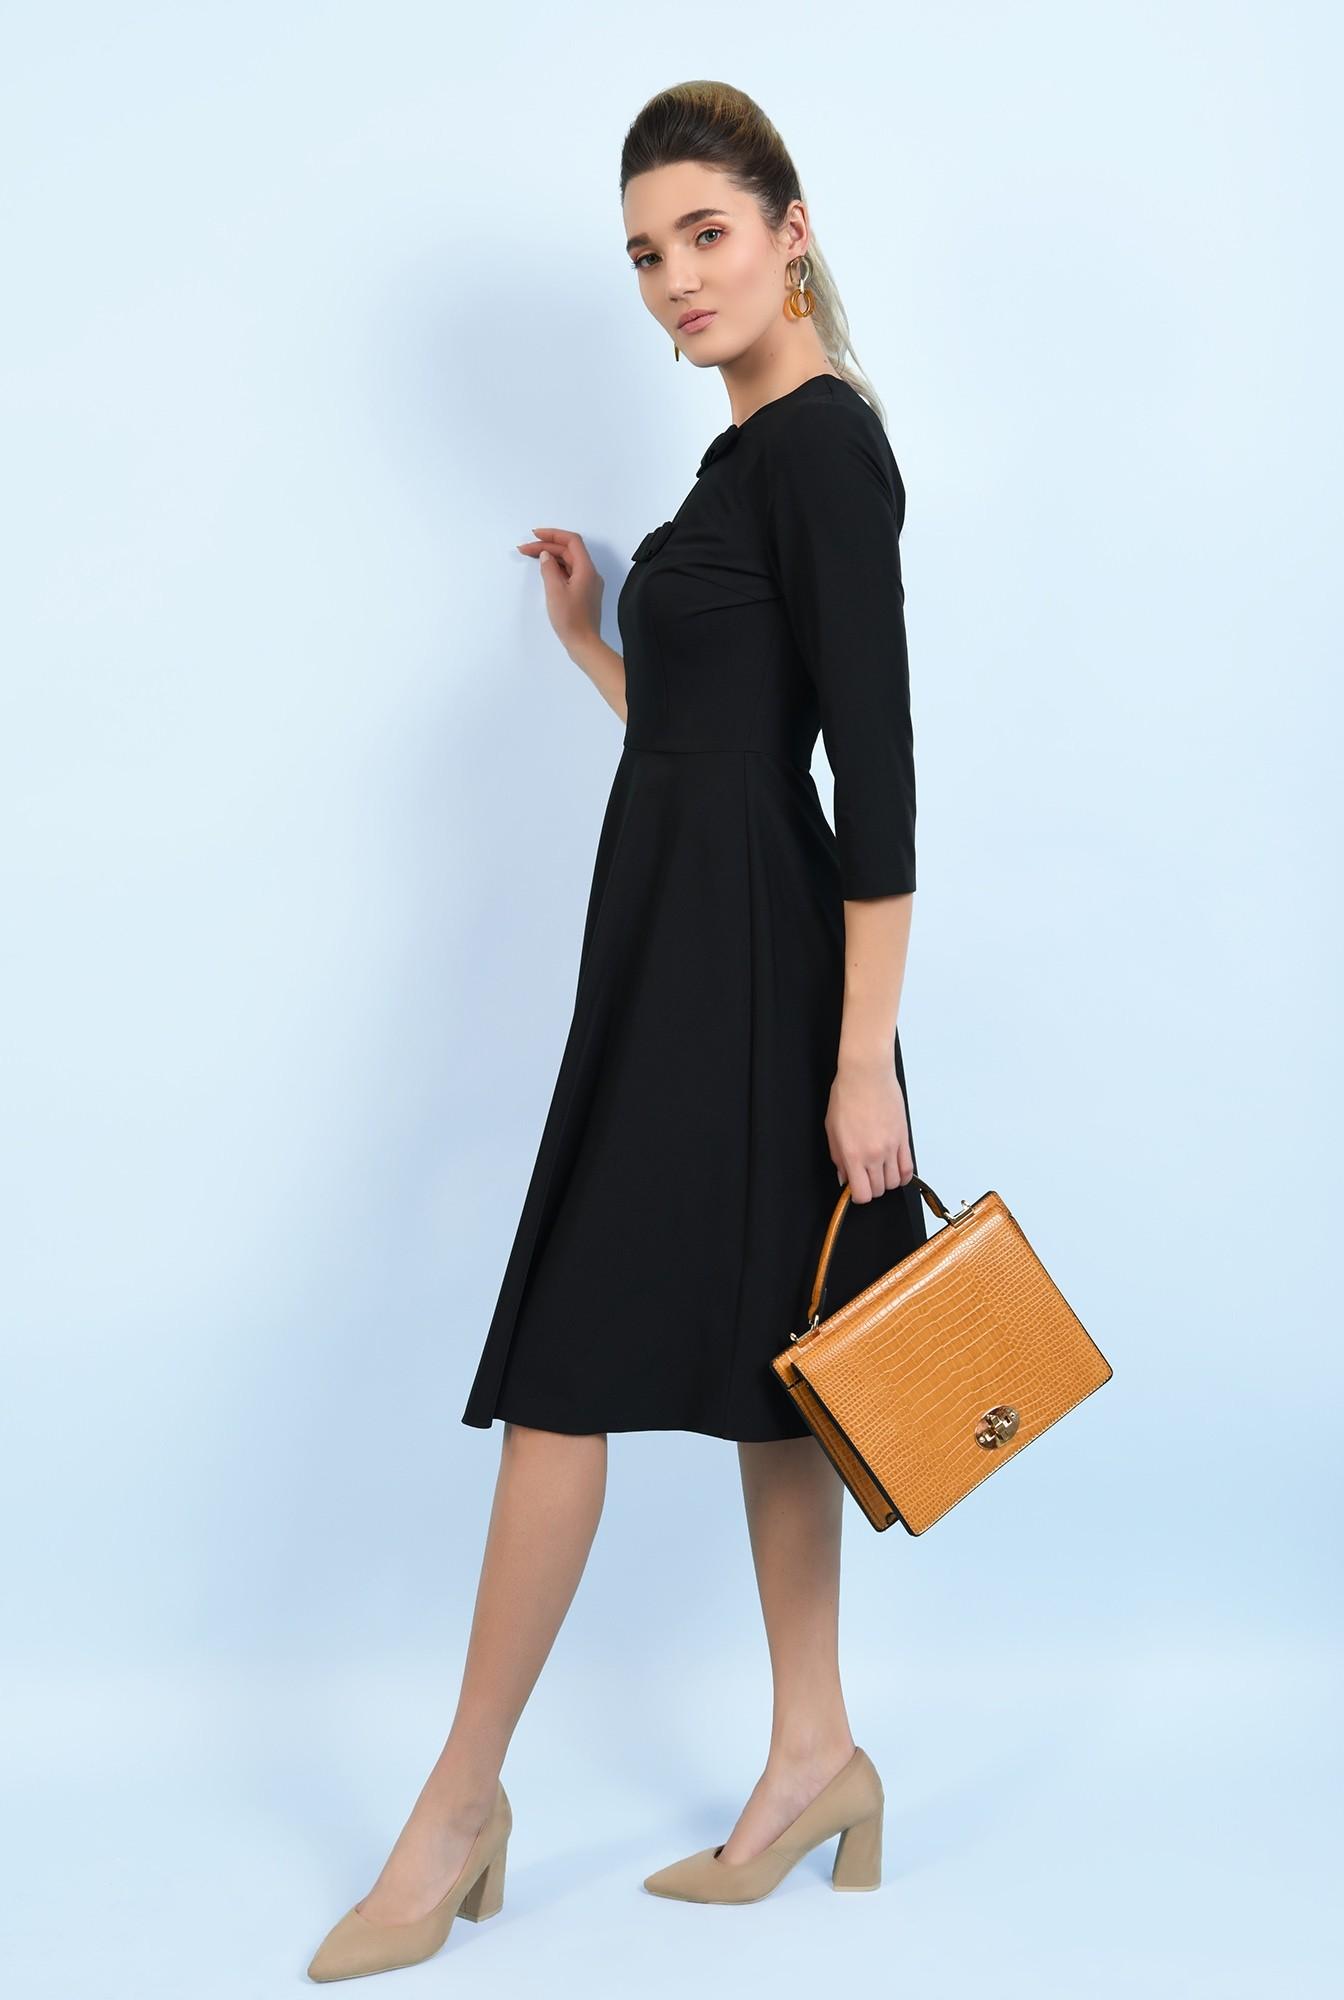 360 - rochie neagra, evazata, cu funde, rochie office, midi